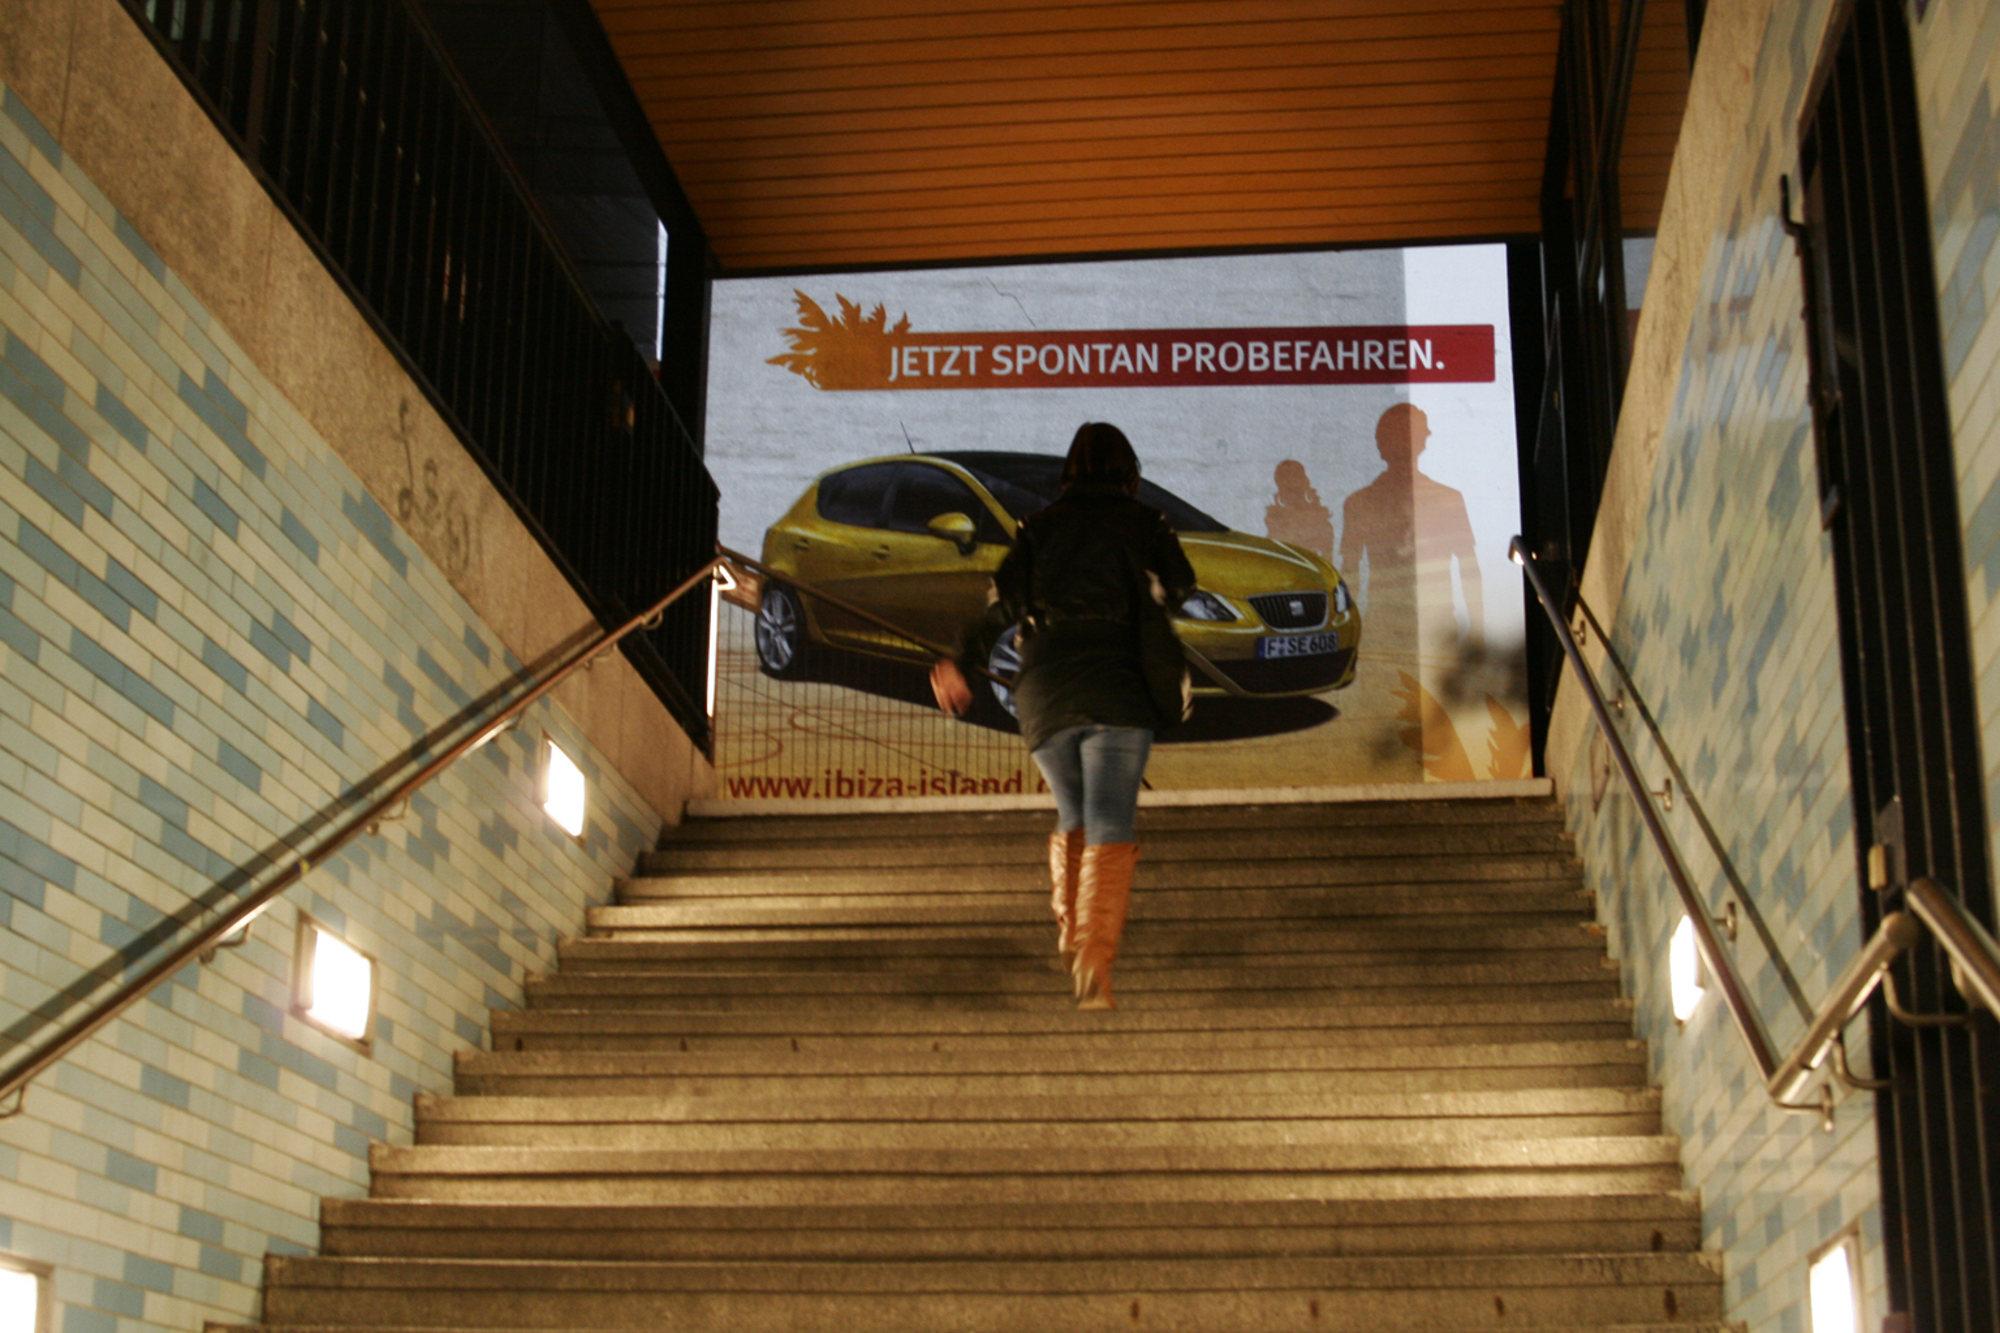 Großprojektion Werbung am U-Bahn Eingang - Digitales-Riesenposter